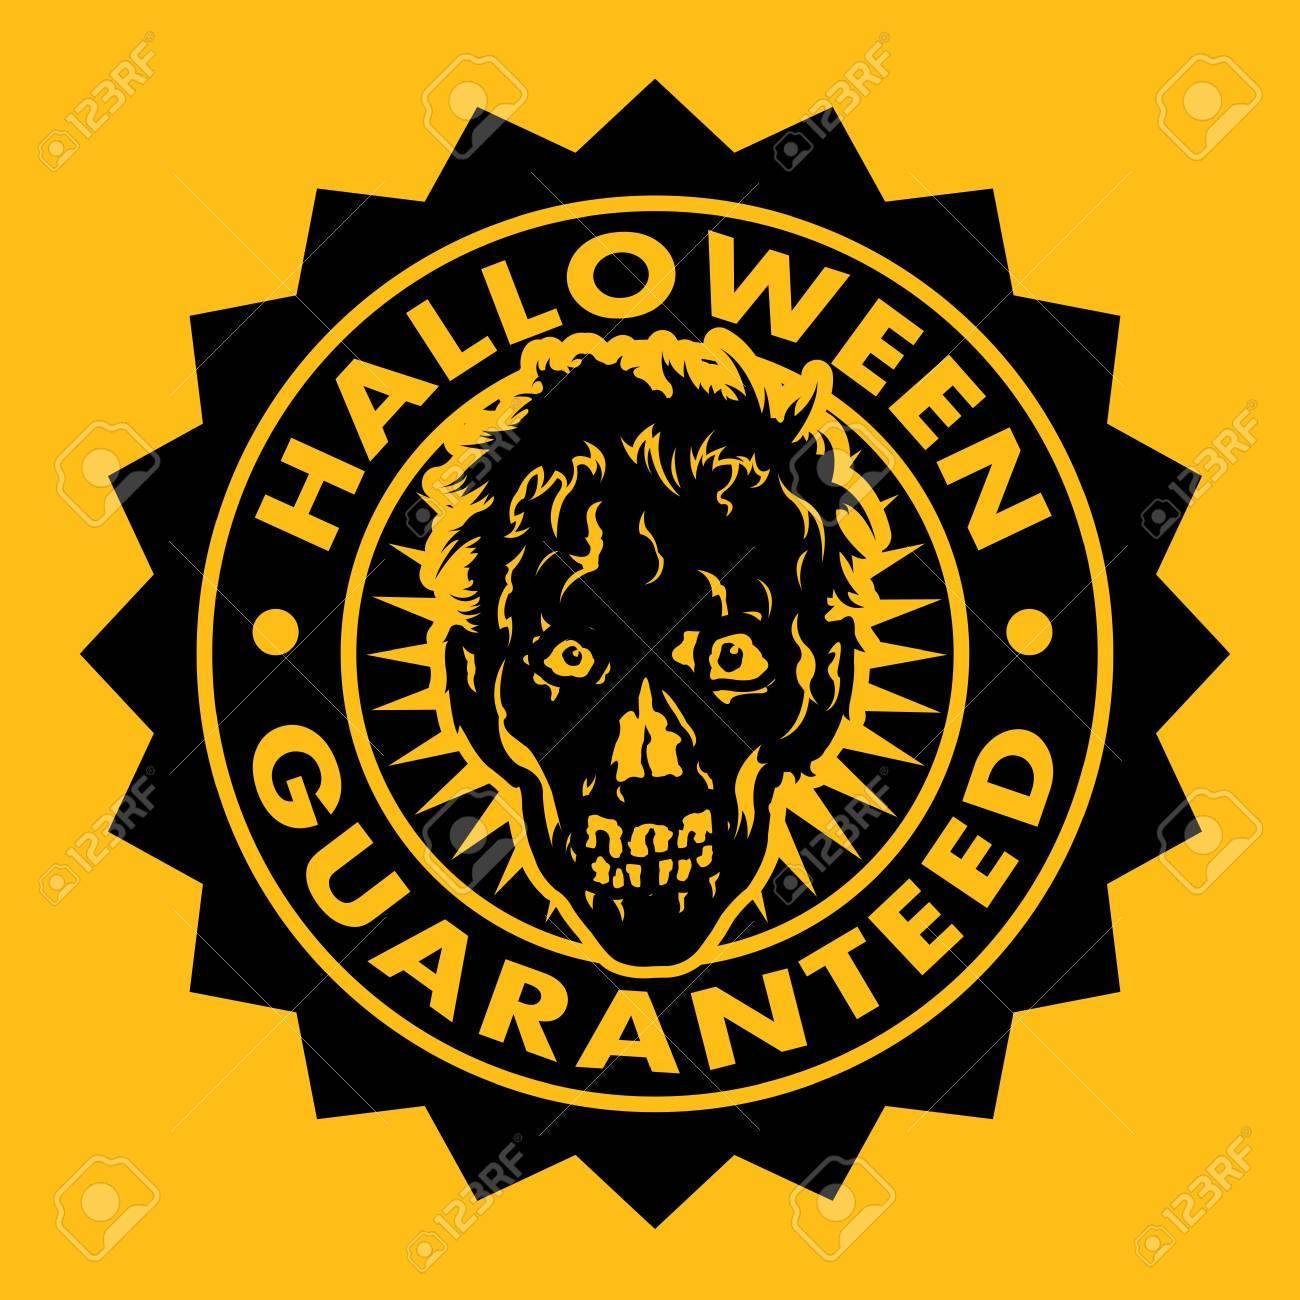 Halloween Guaranteed Zombie Seal Stock Vector - 15686578